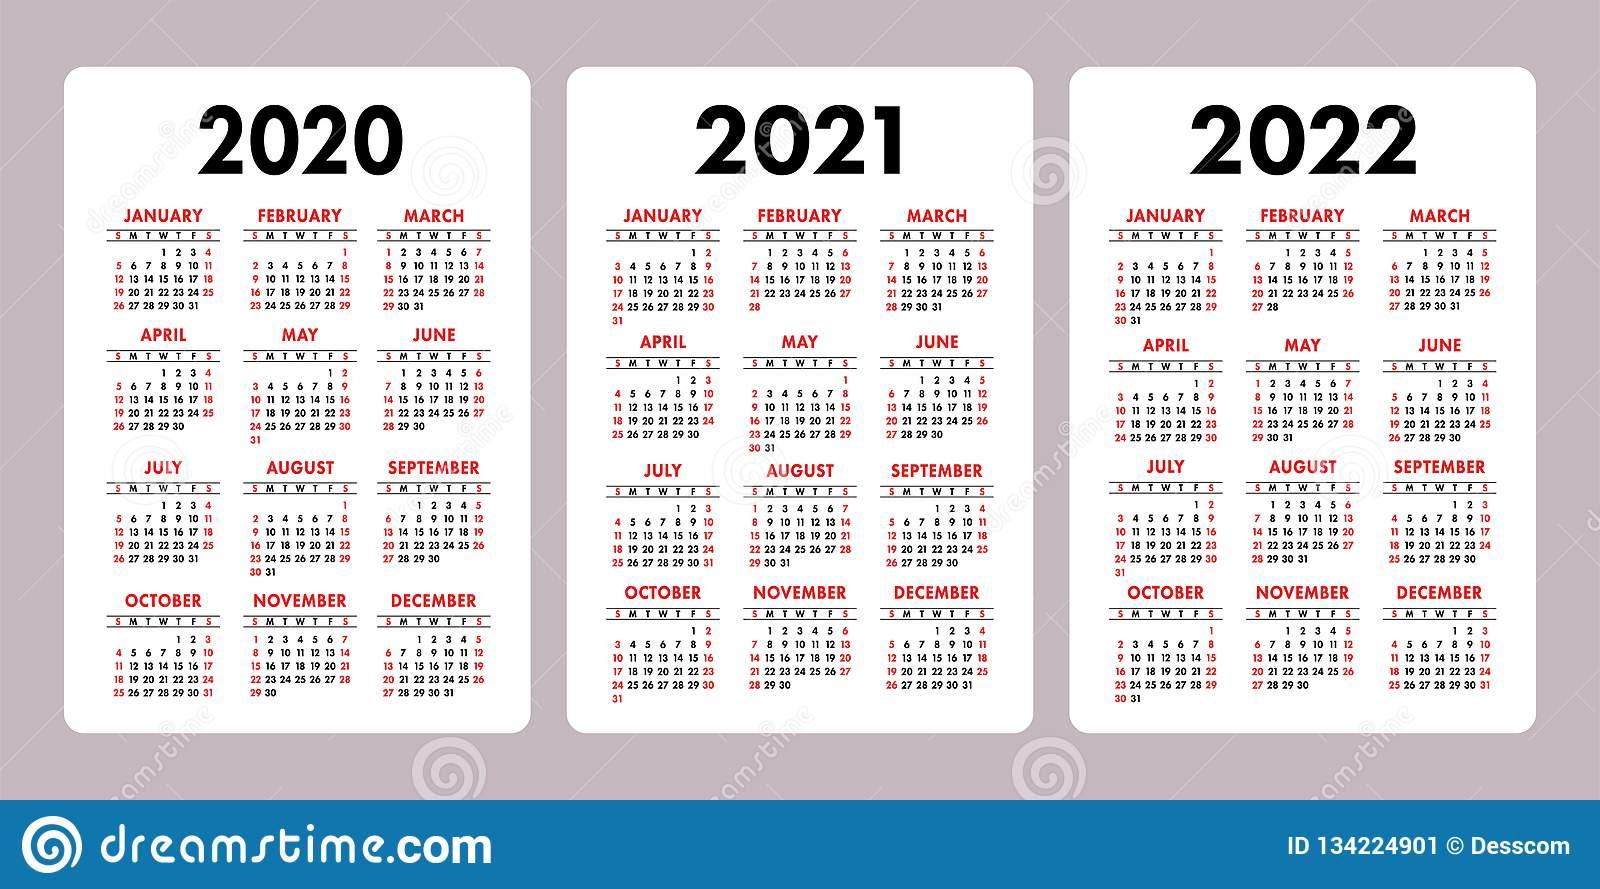 Calendar 2020, 2021, 2022 Years. Vertical Vector Calender for Free Printable Calendar 2020-2022